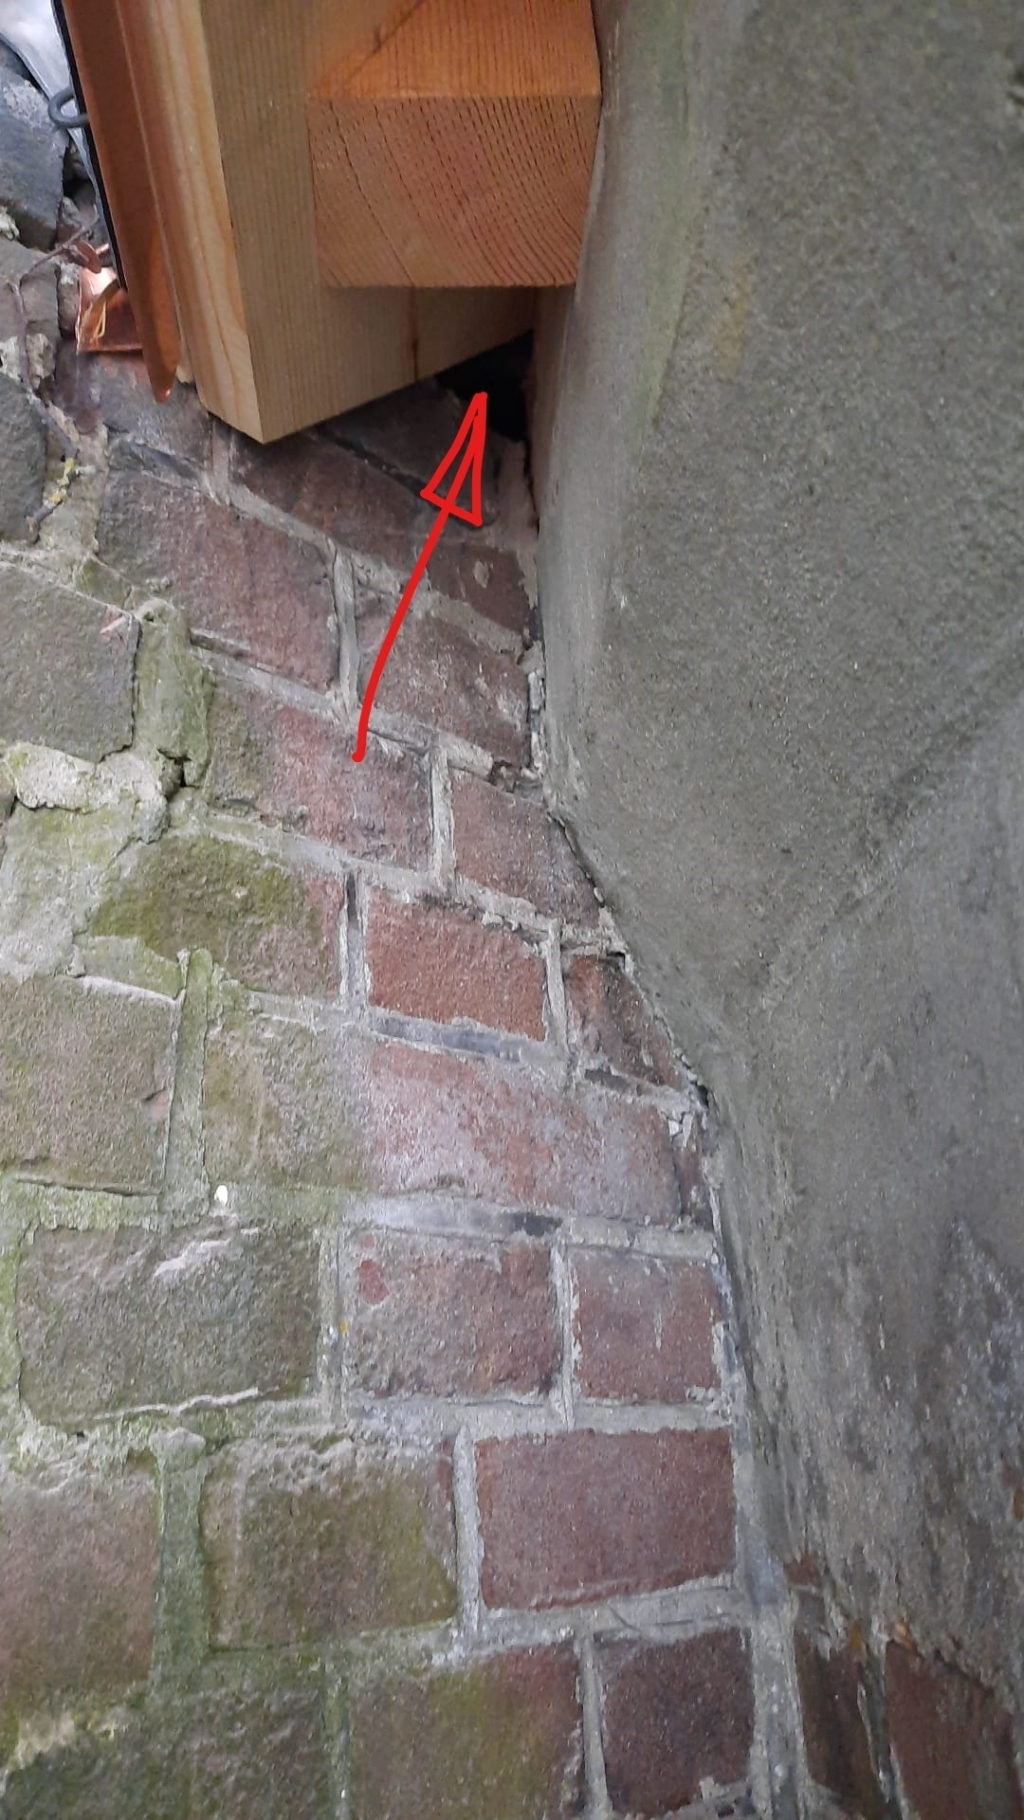 De kleine gaten waar de vleermuizen zitten. (Foto: Co Wiskerke) © rodi